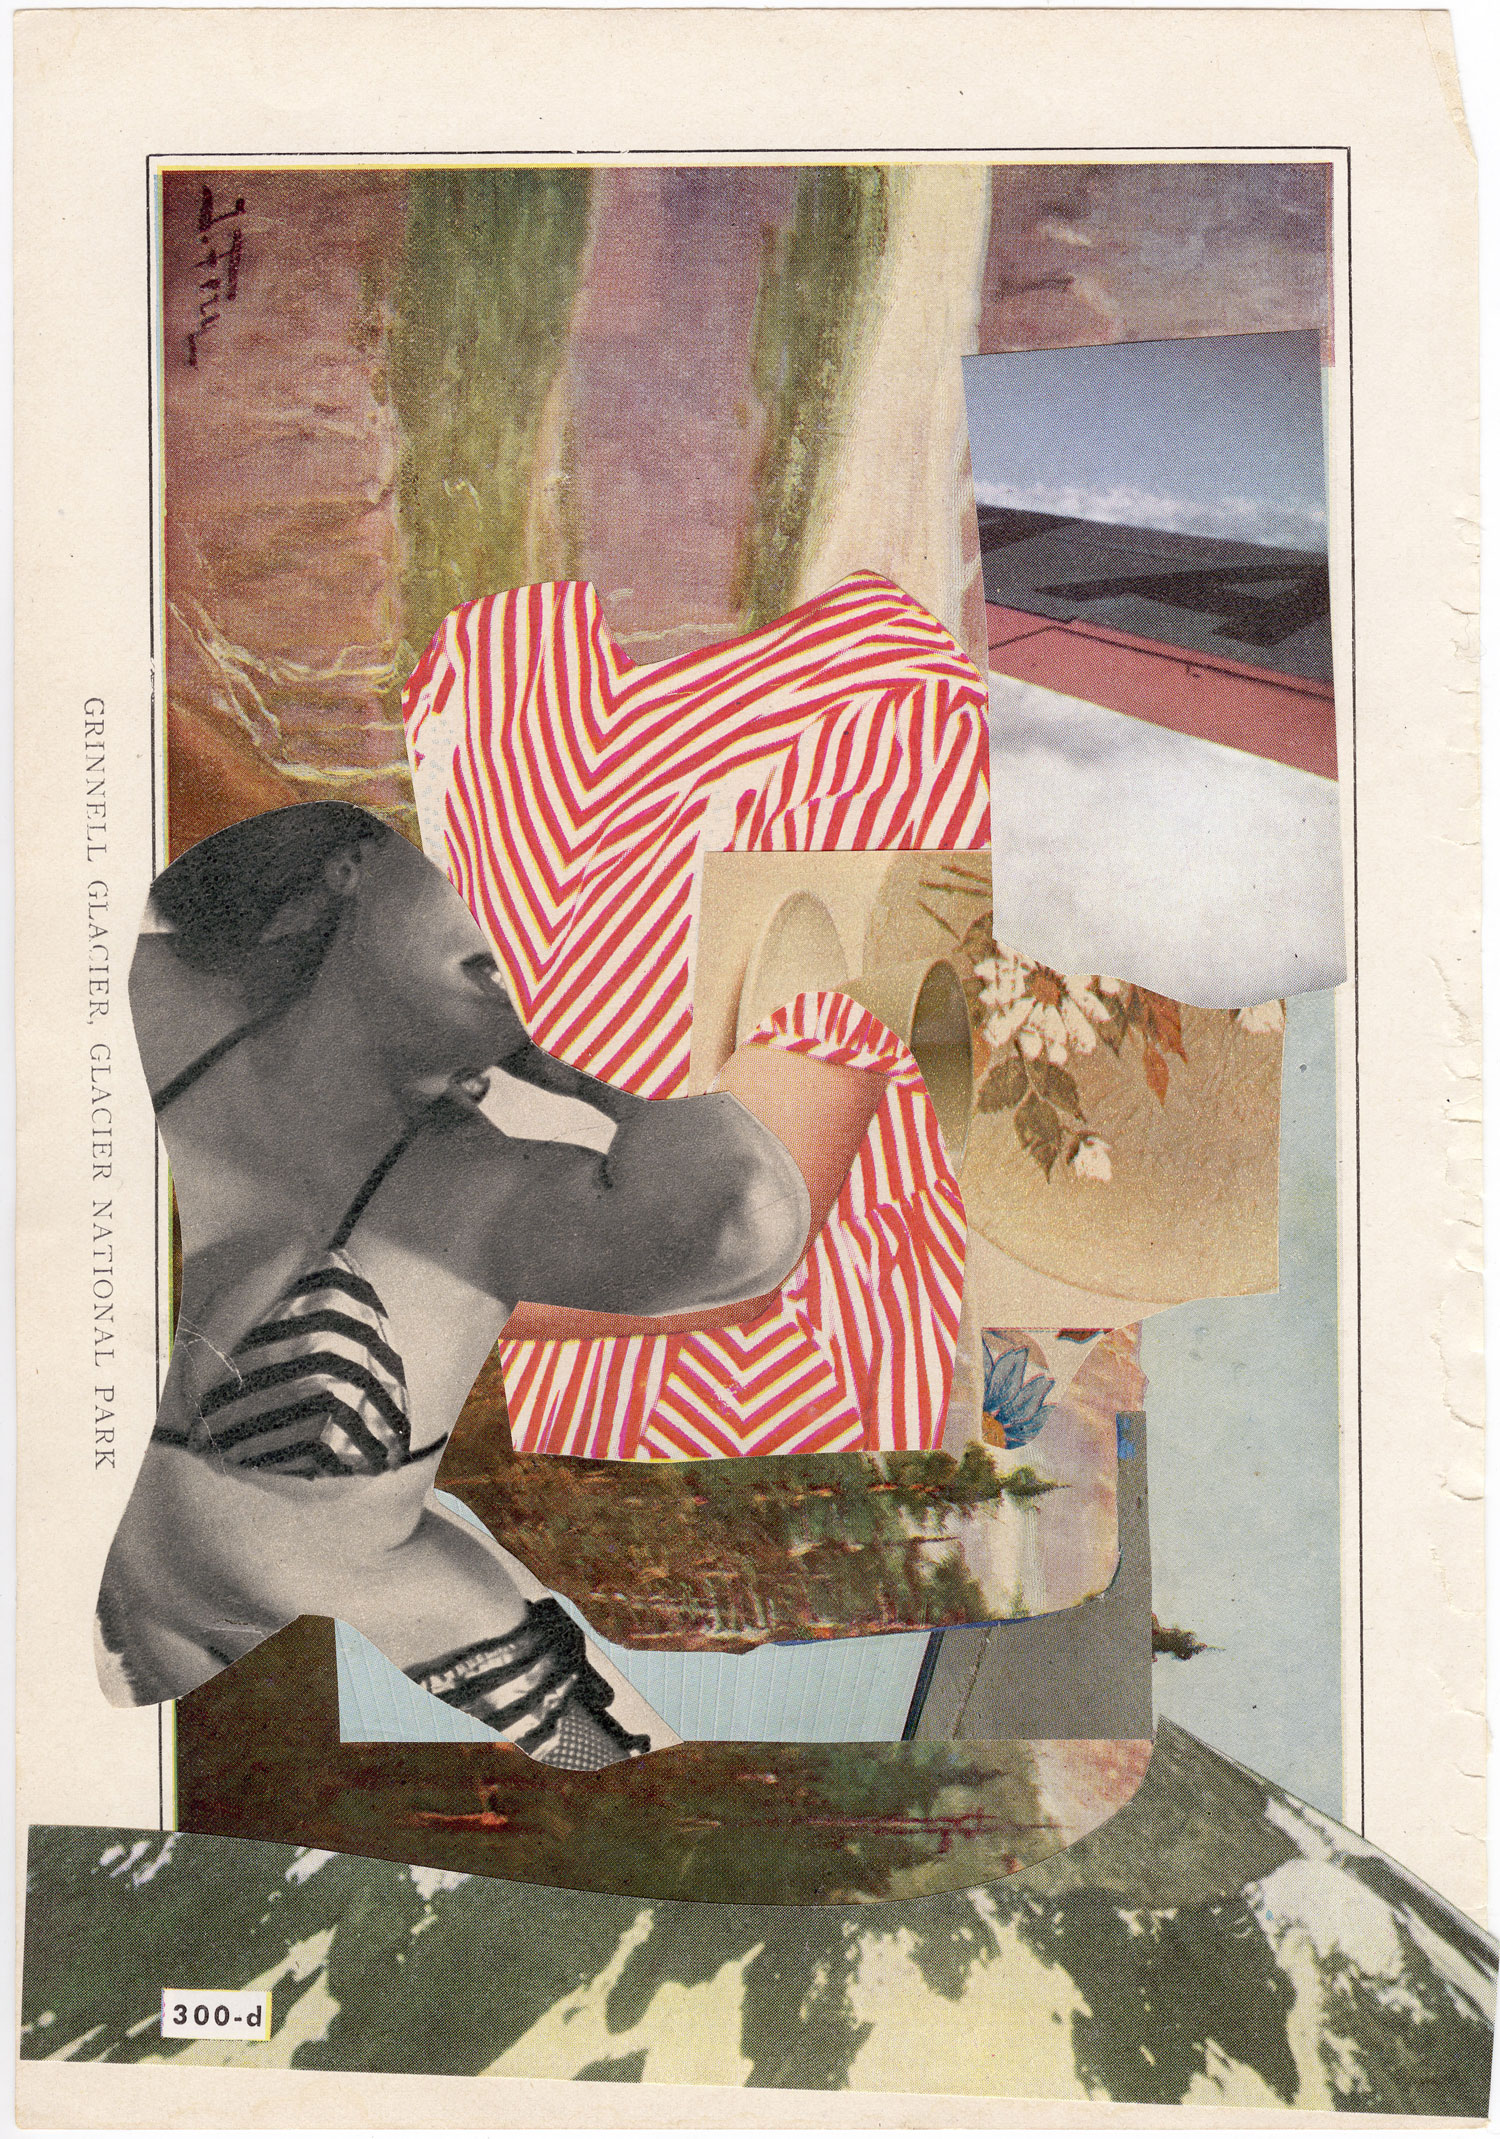 john-gall-collage-art-ashcan-move.jpg